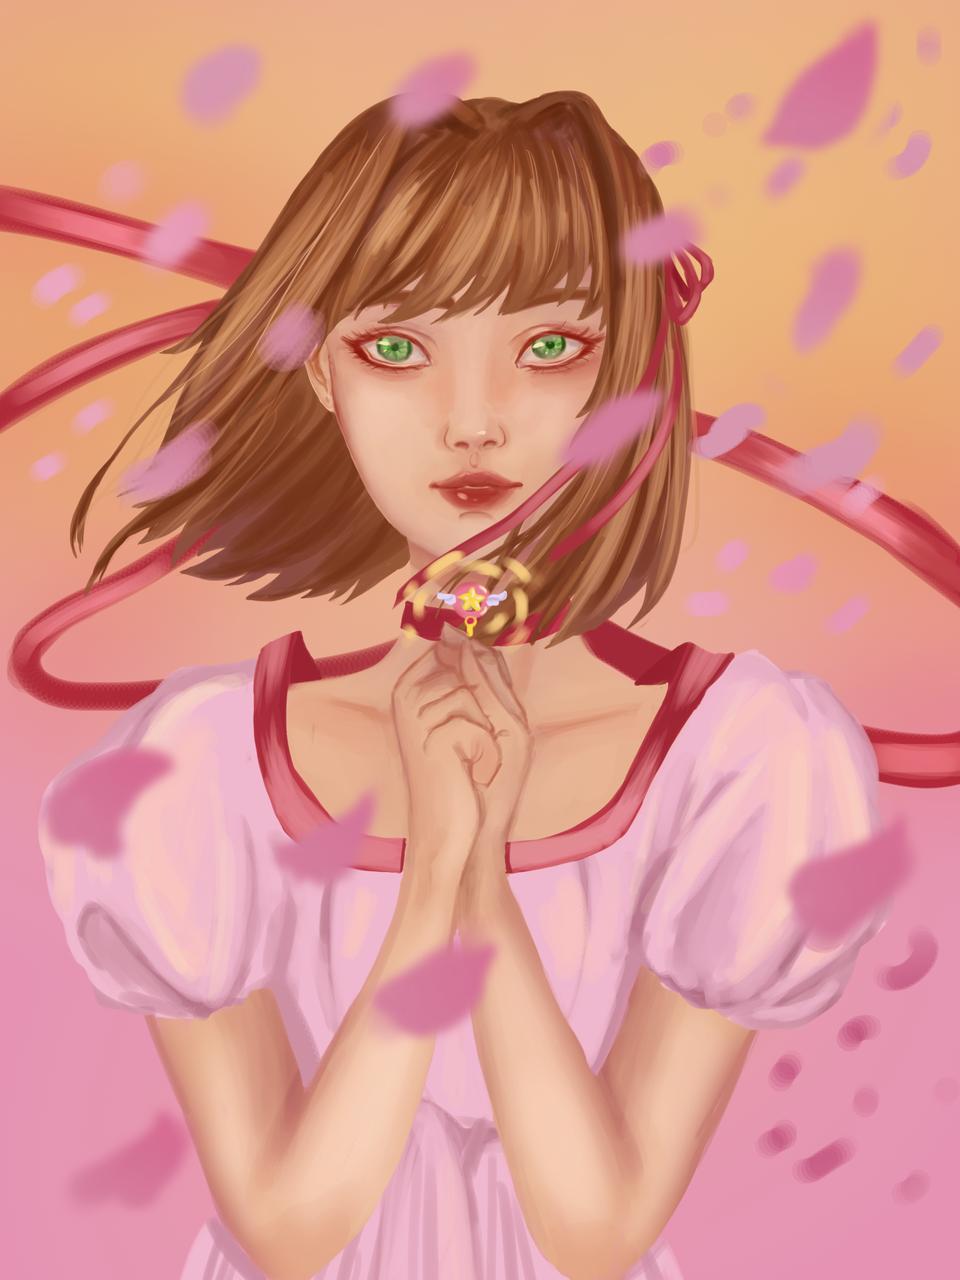 Sakura (From Sakura Card Captors)